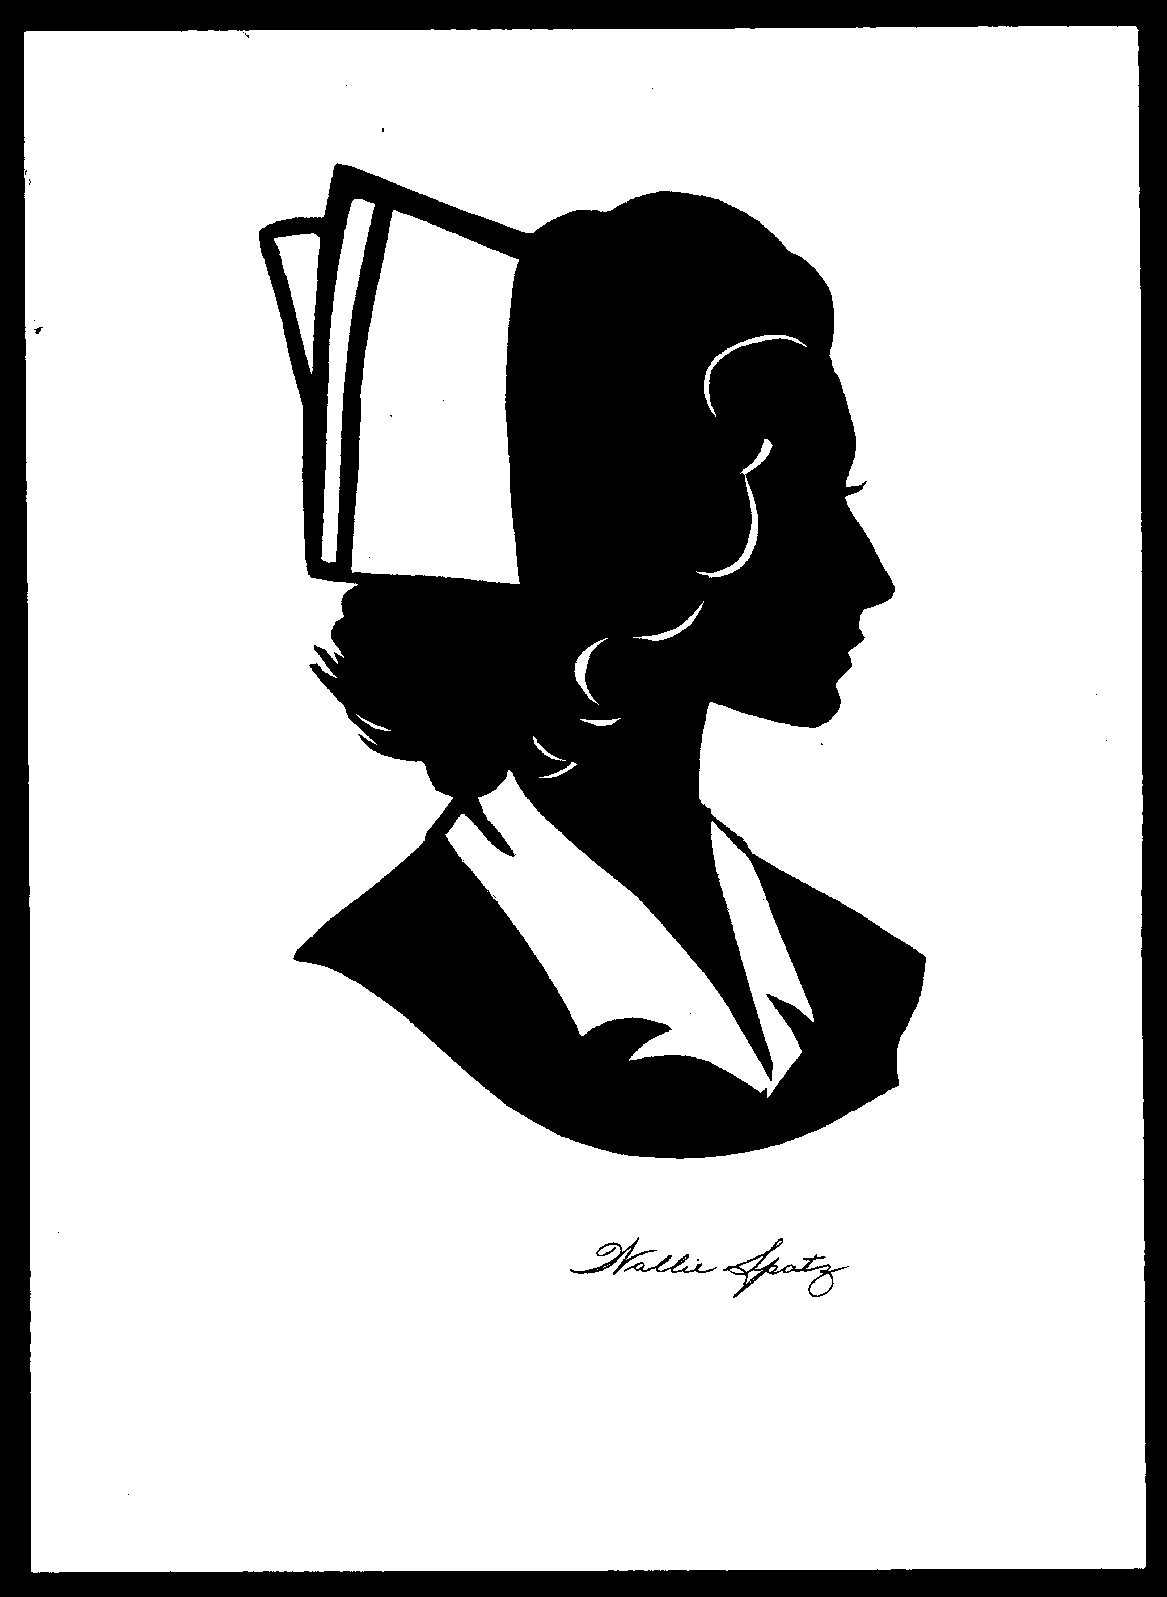 Free Nurse Silhouette Cliparts, Download Free Clip Art, Free.